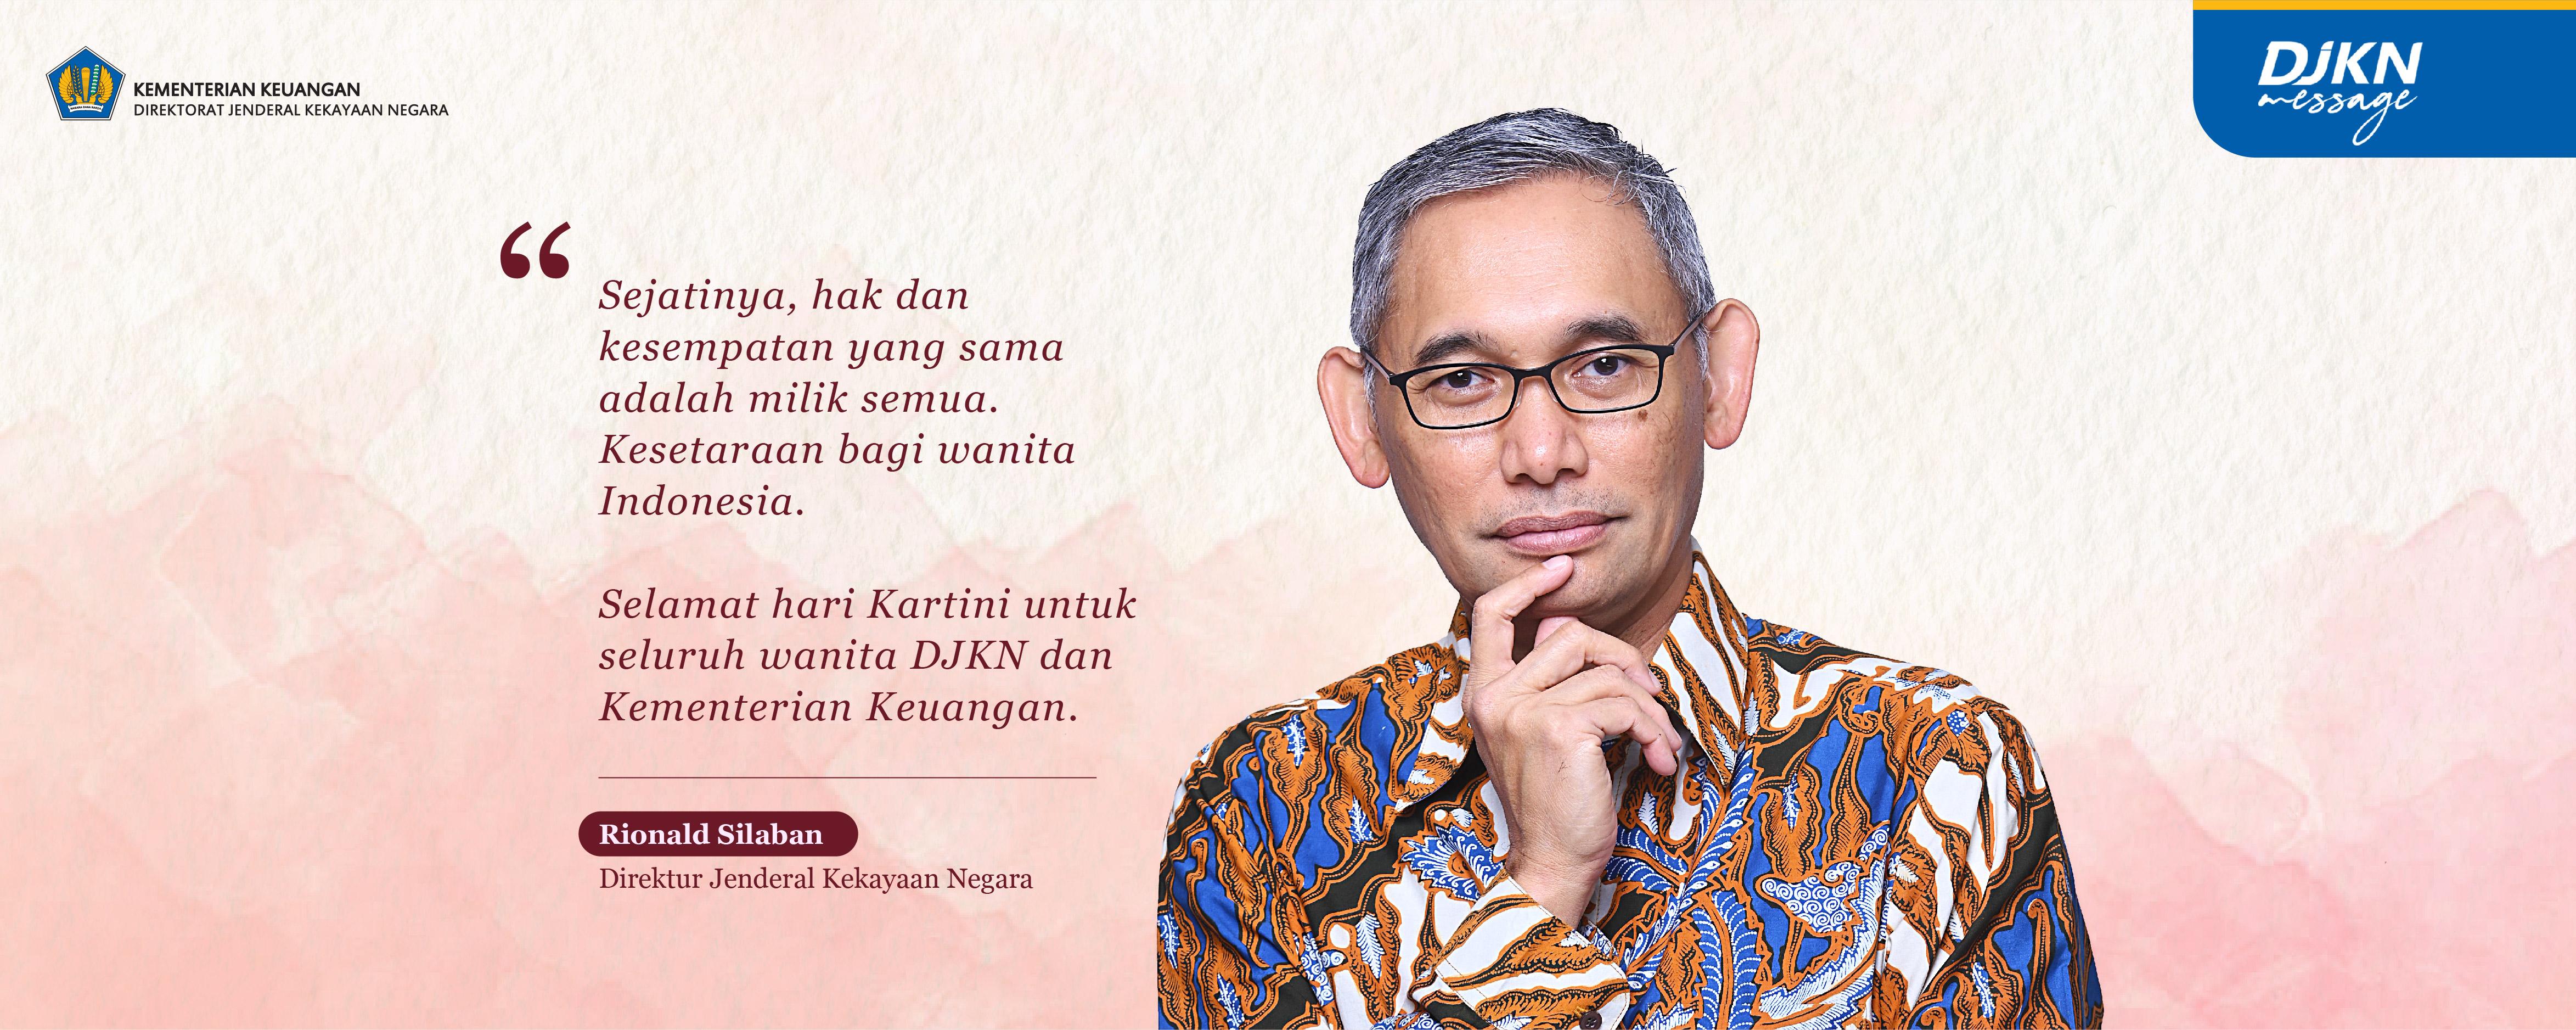 DJKN Message_HARIKARTINI